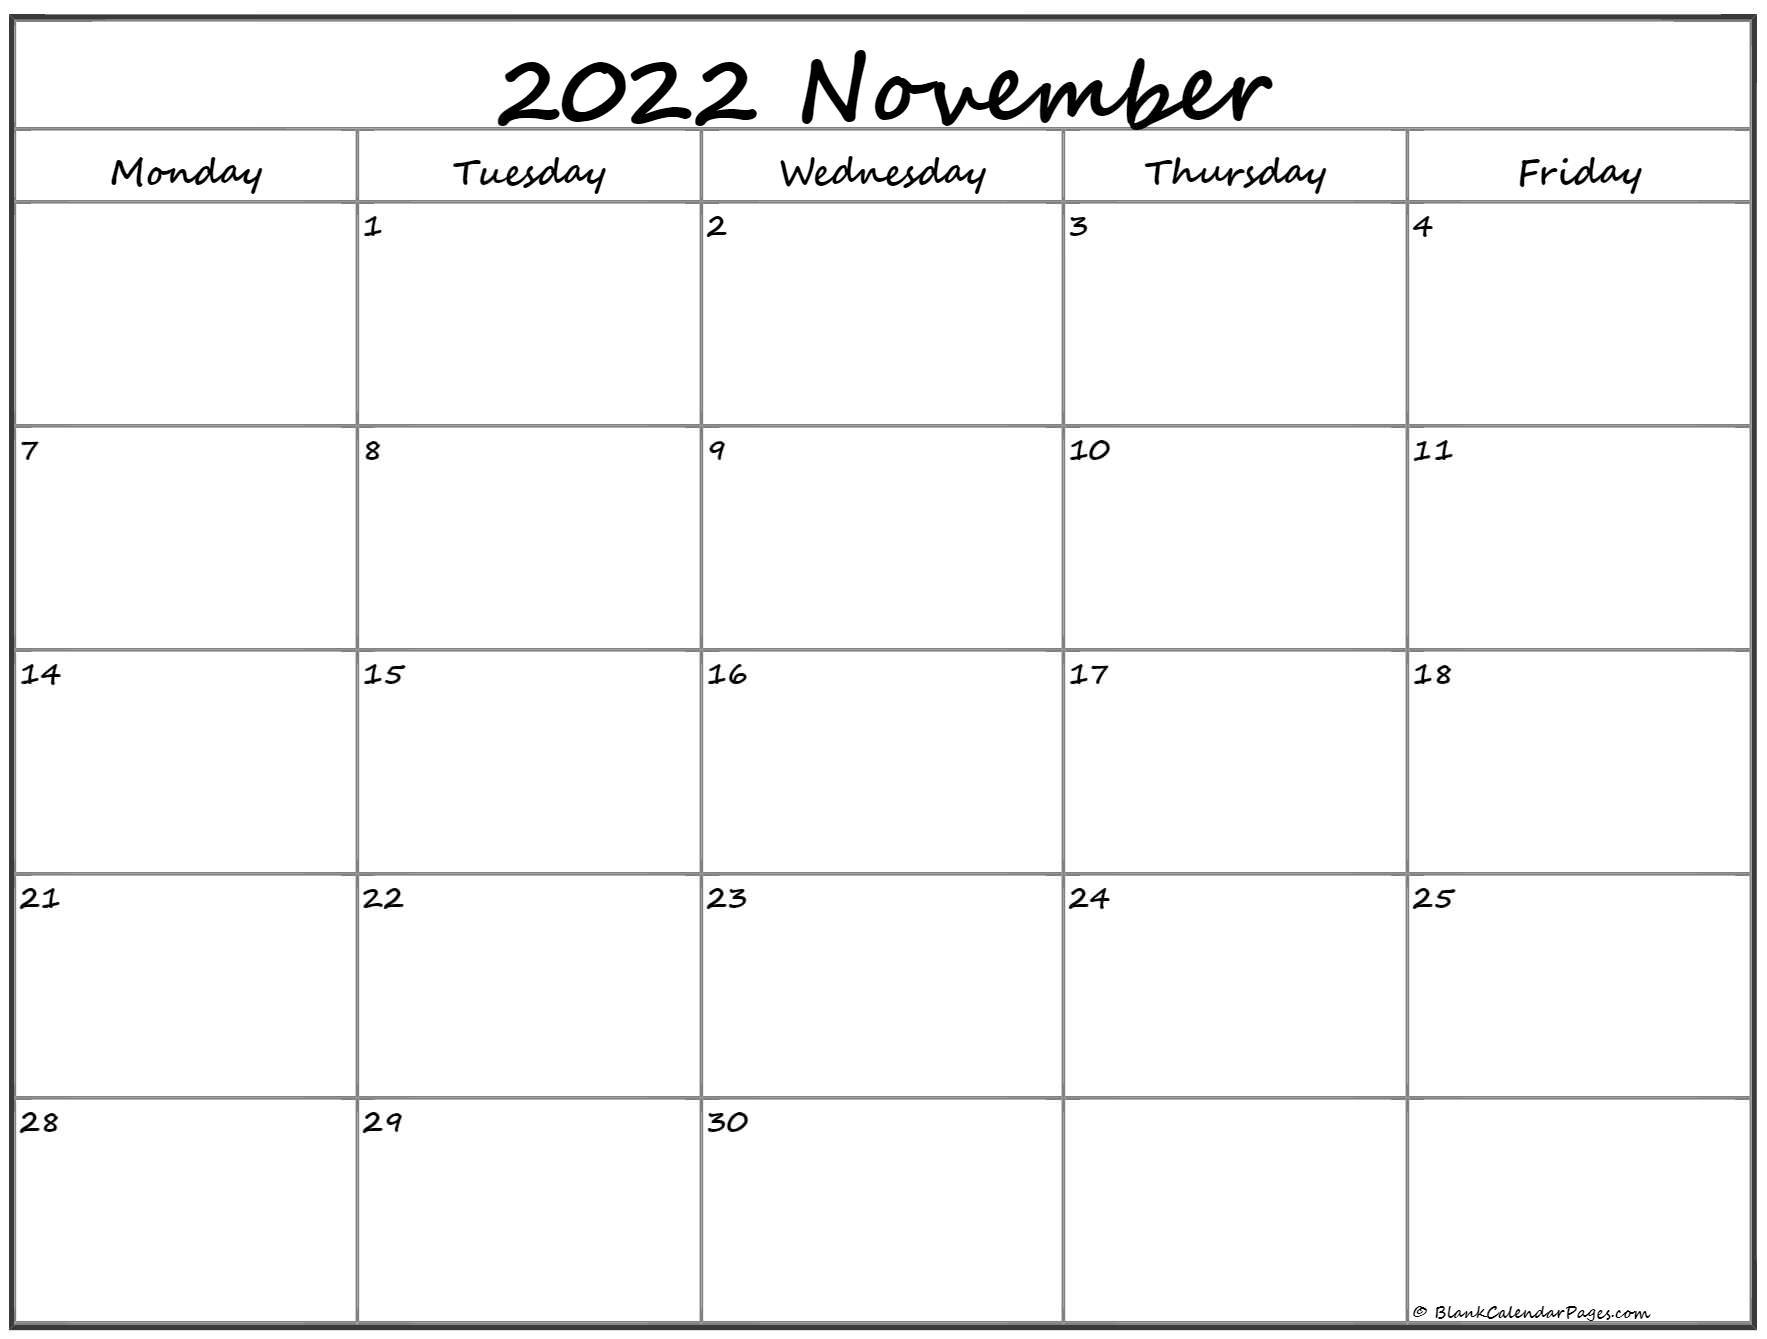 November 2022 Monday Calendar | Monday to Sunday